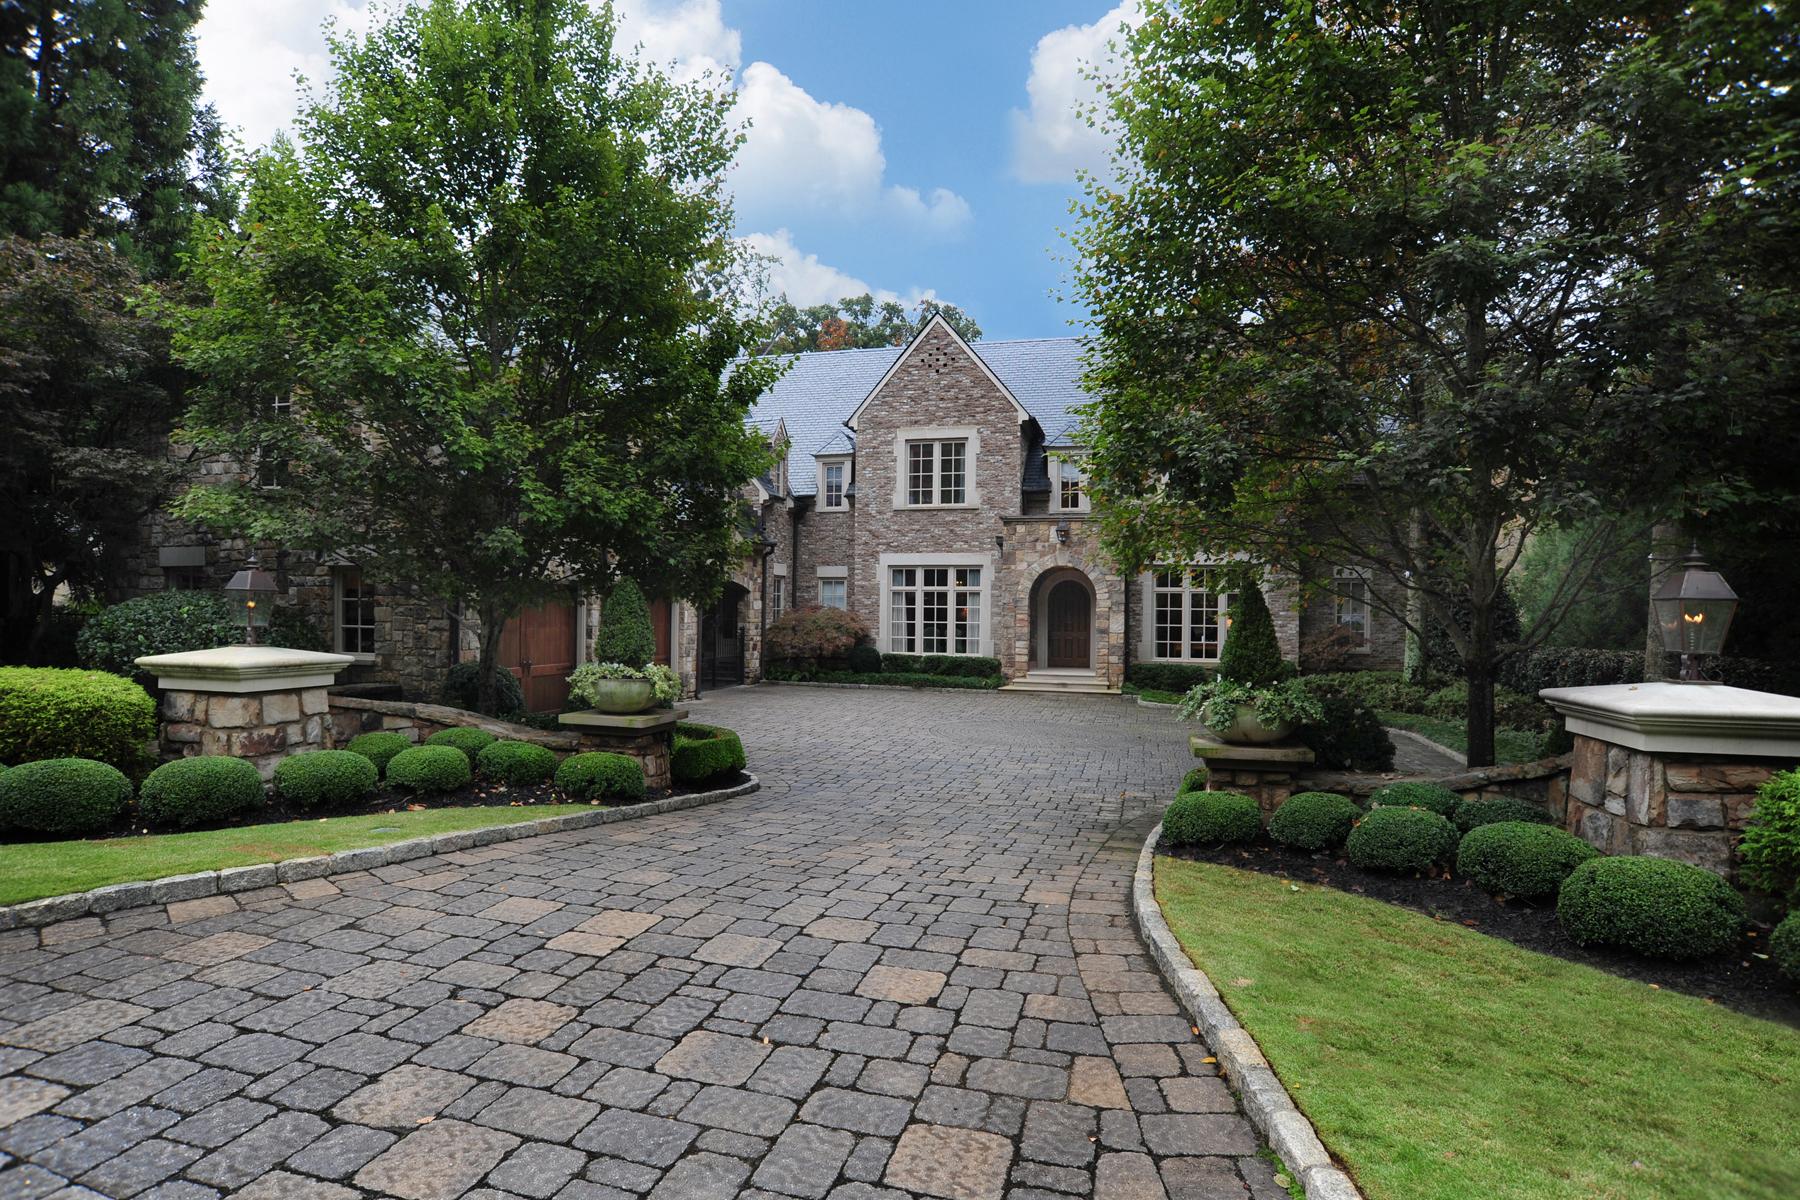 独户住宅 为 销售 在 Refined Elegance In Atlanta's Most Prestigious Neighborhood 675 West Paces Ferry Road NW Home 4 Buckhead, 亚特兰大, 乔治亚州, 30327 美国